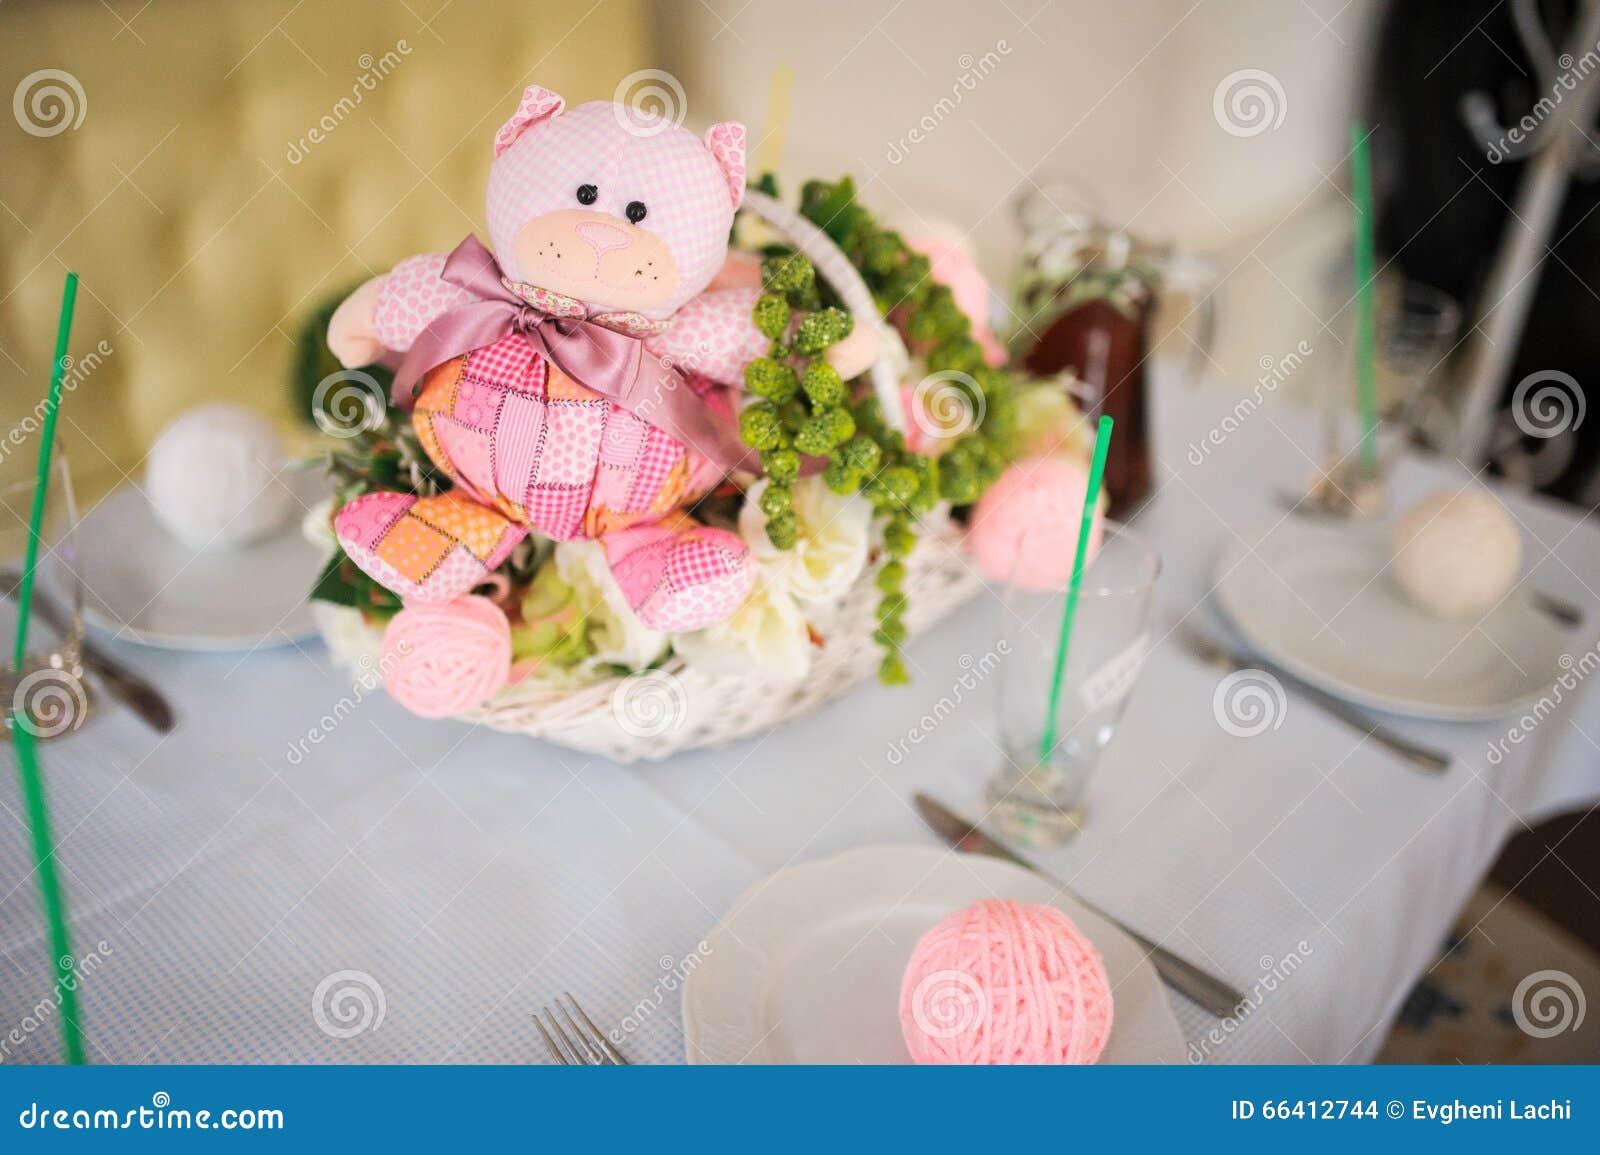 Baby Birthday Decor Or Shower Pink Bear